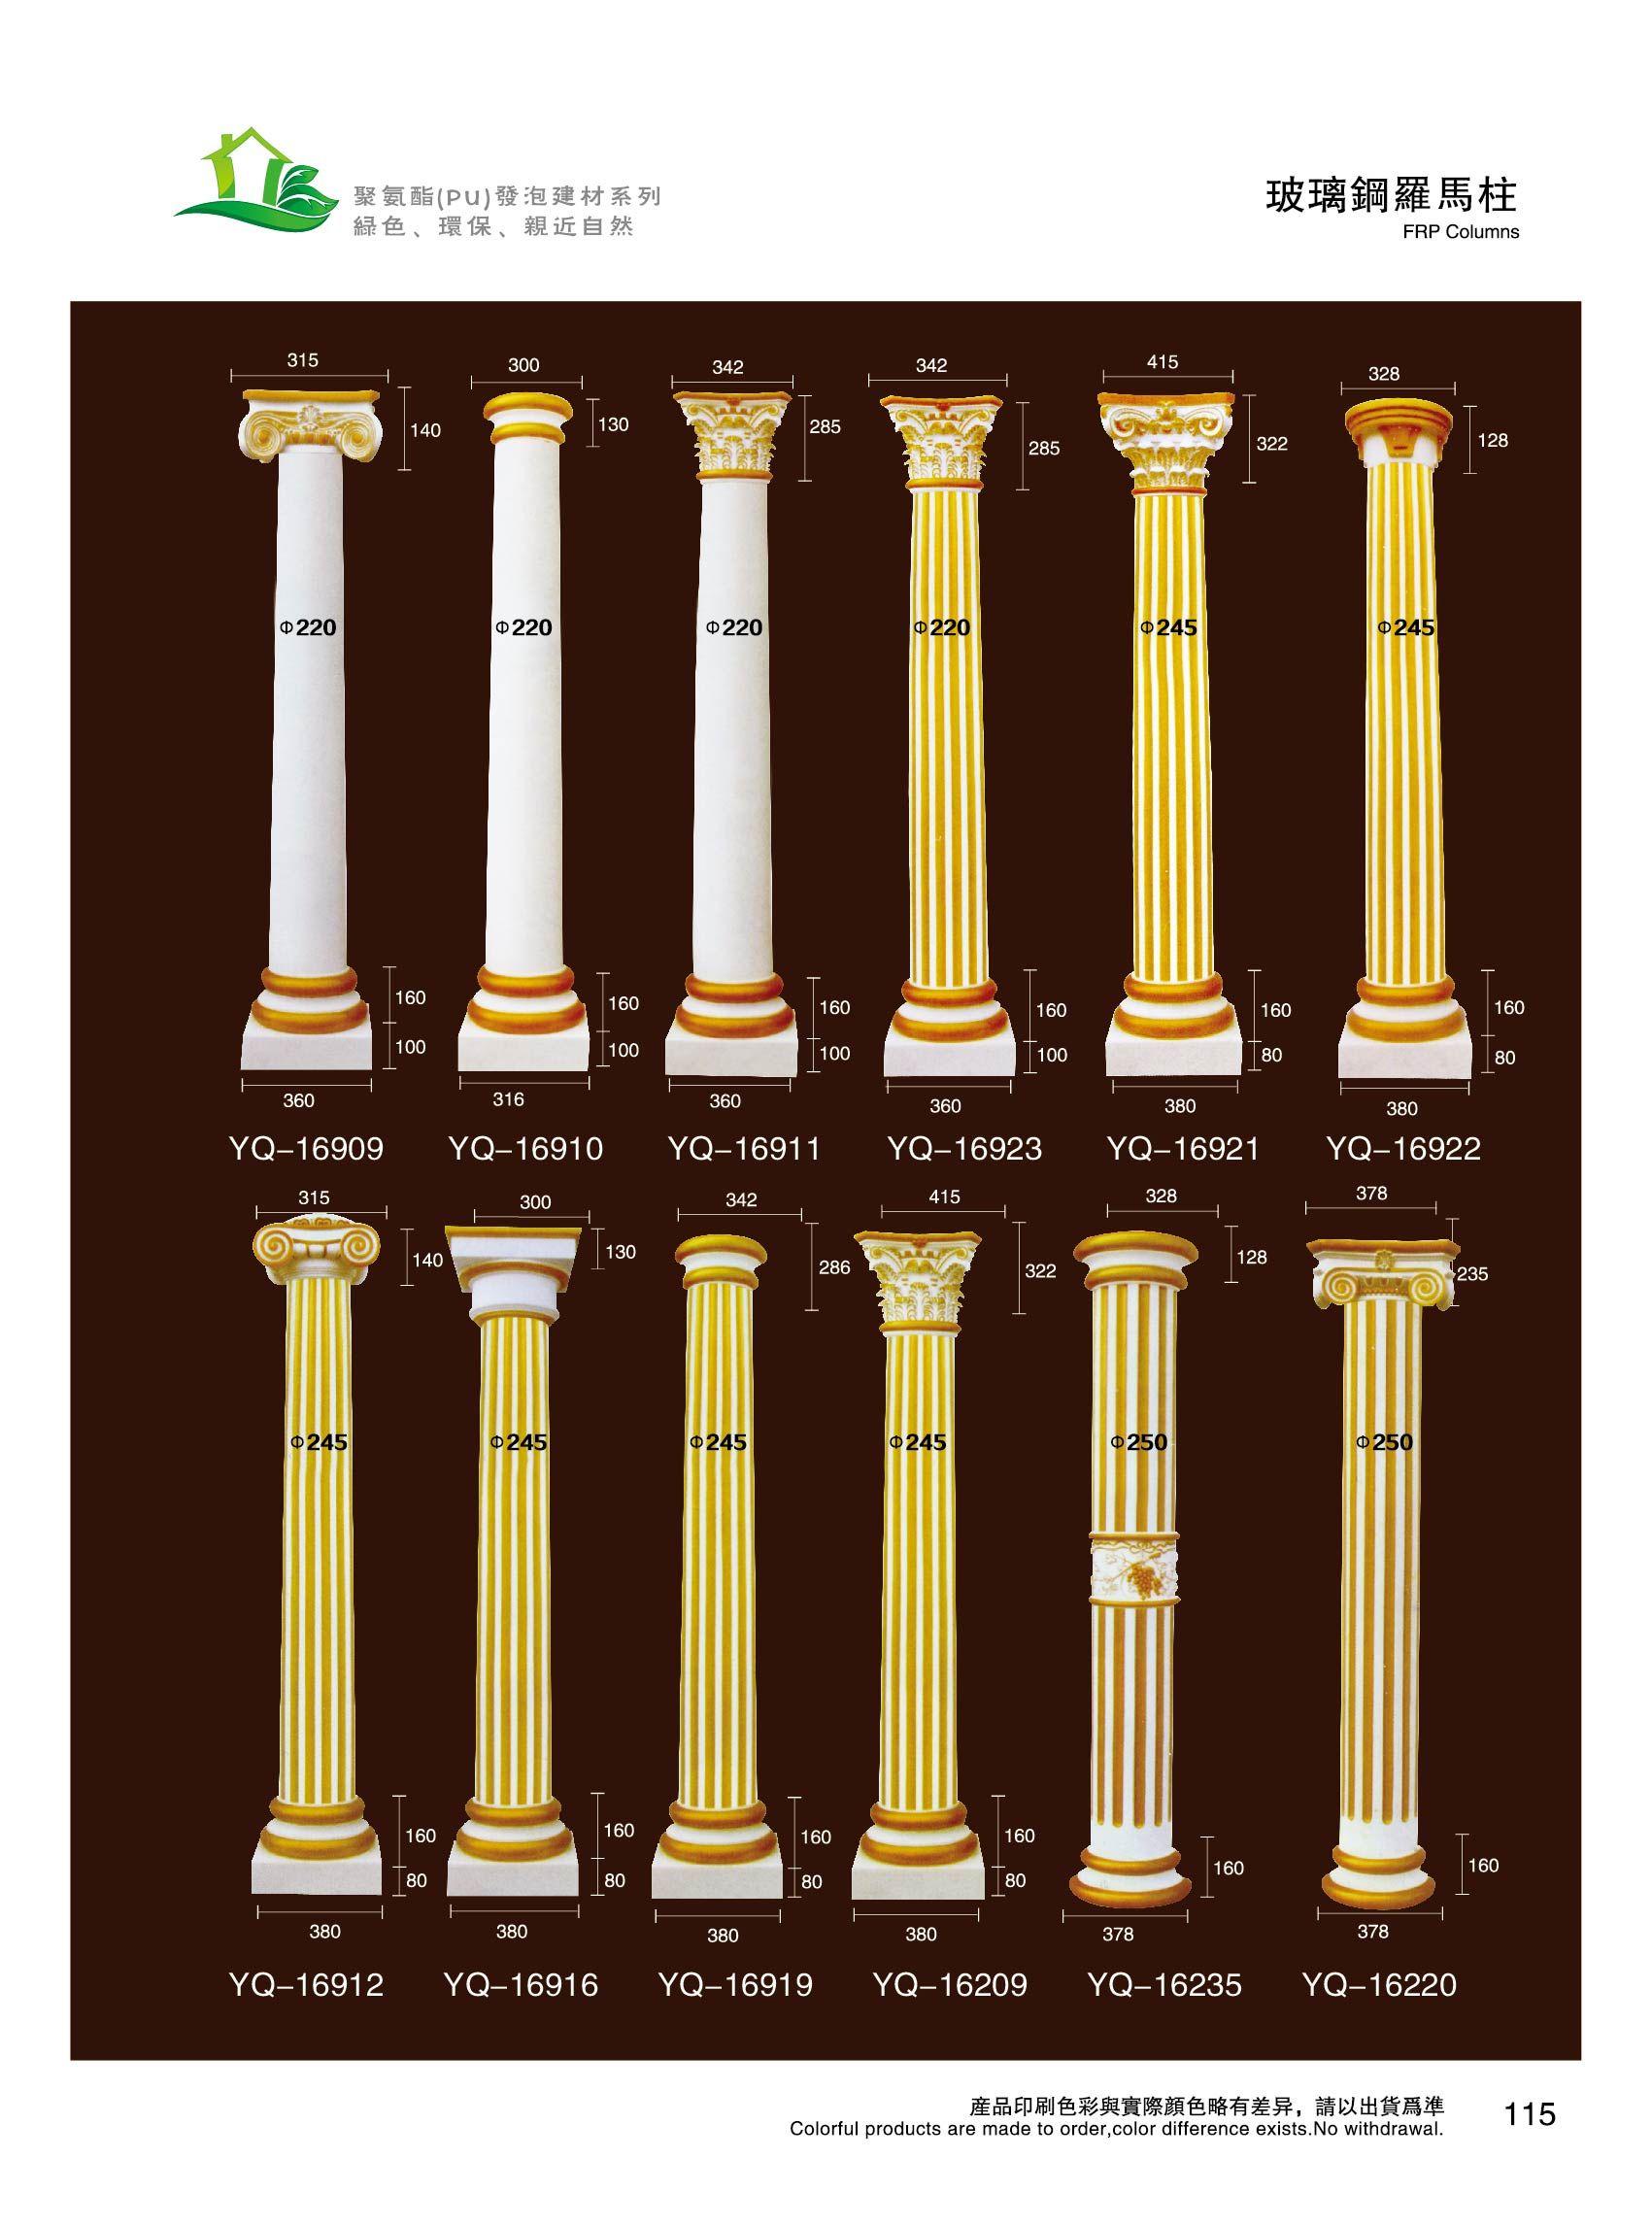 Frp Columns Taper Candle Column Decor